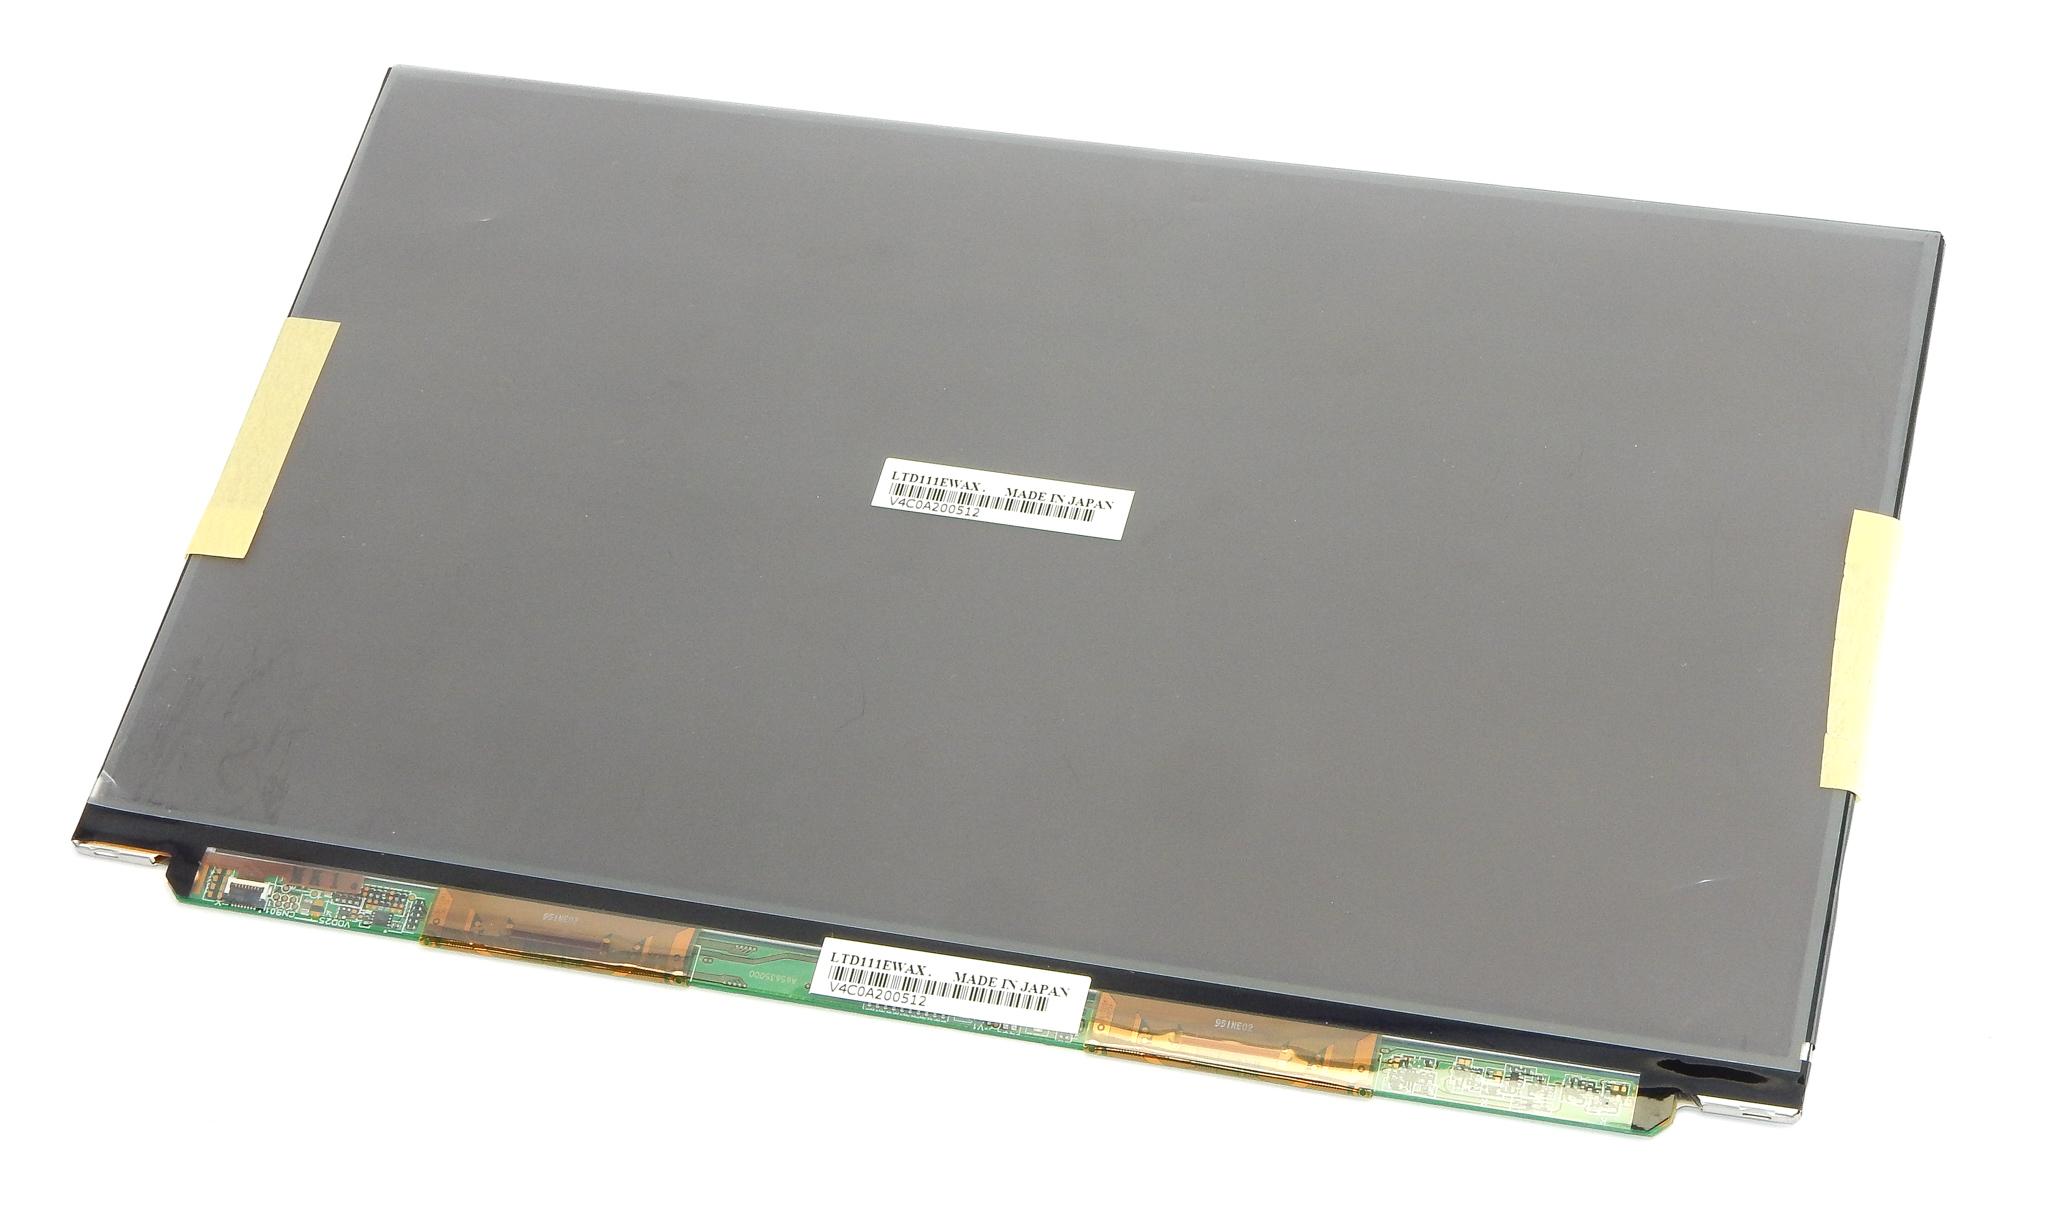 "Sony A1289824A LTD111EWAX 11.1"" WXGA LED LCD Screen"